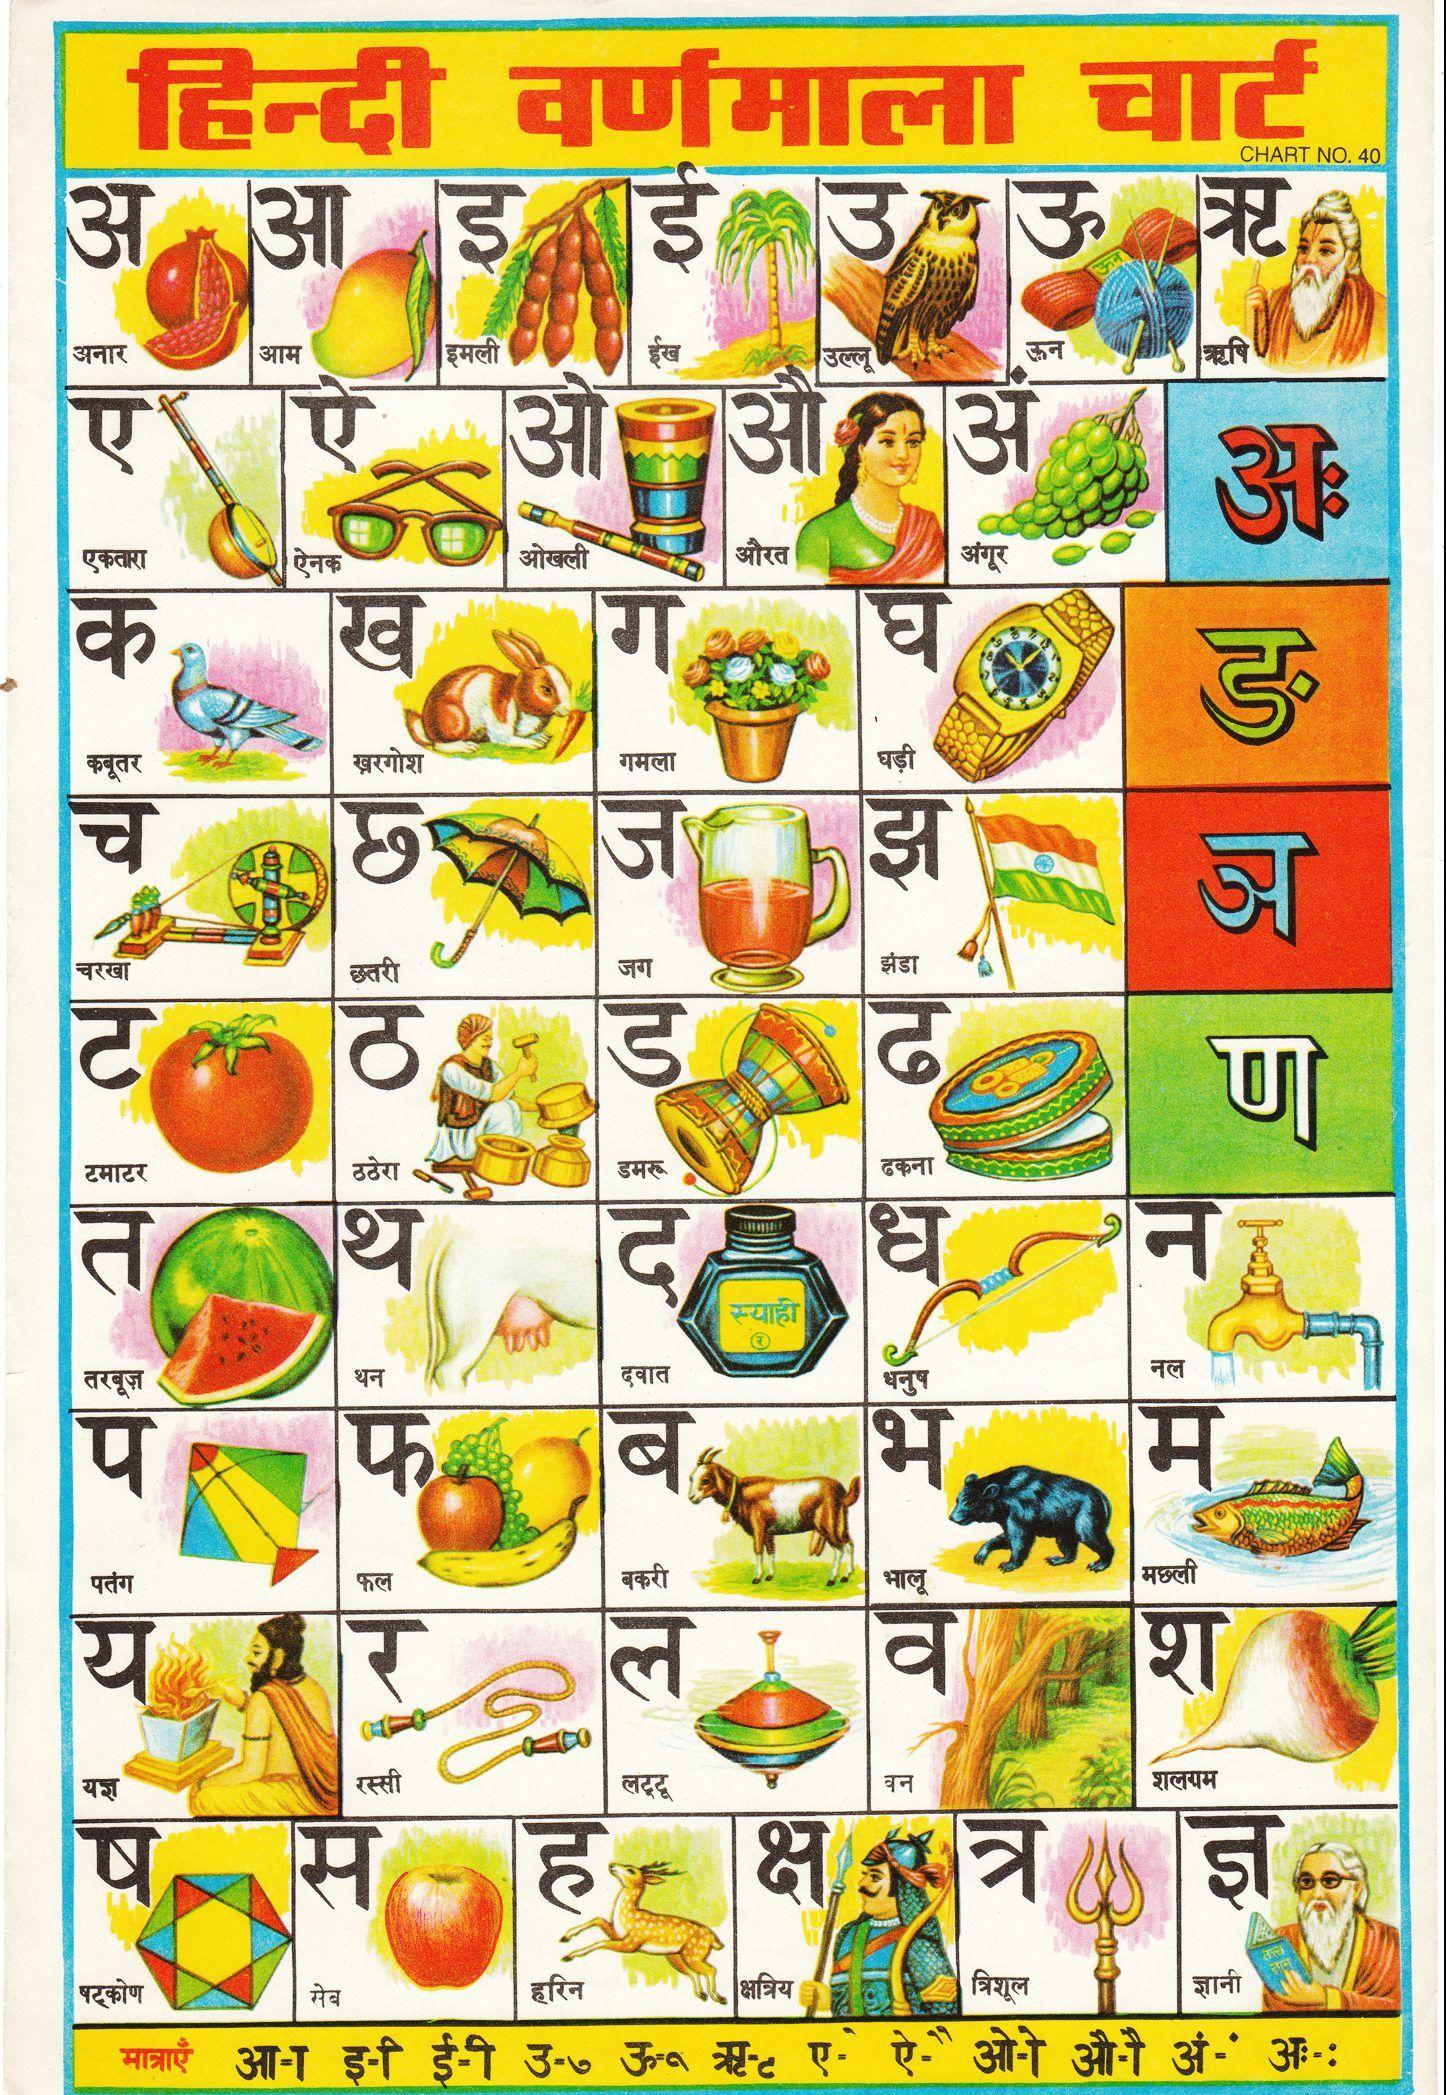 Hindi Aksharmala And Varnamala Chart